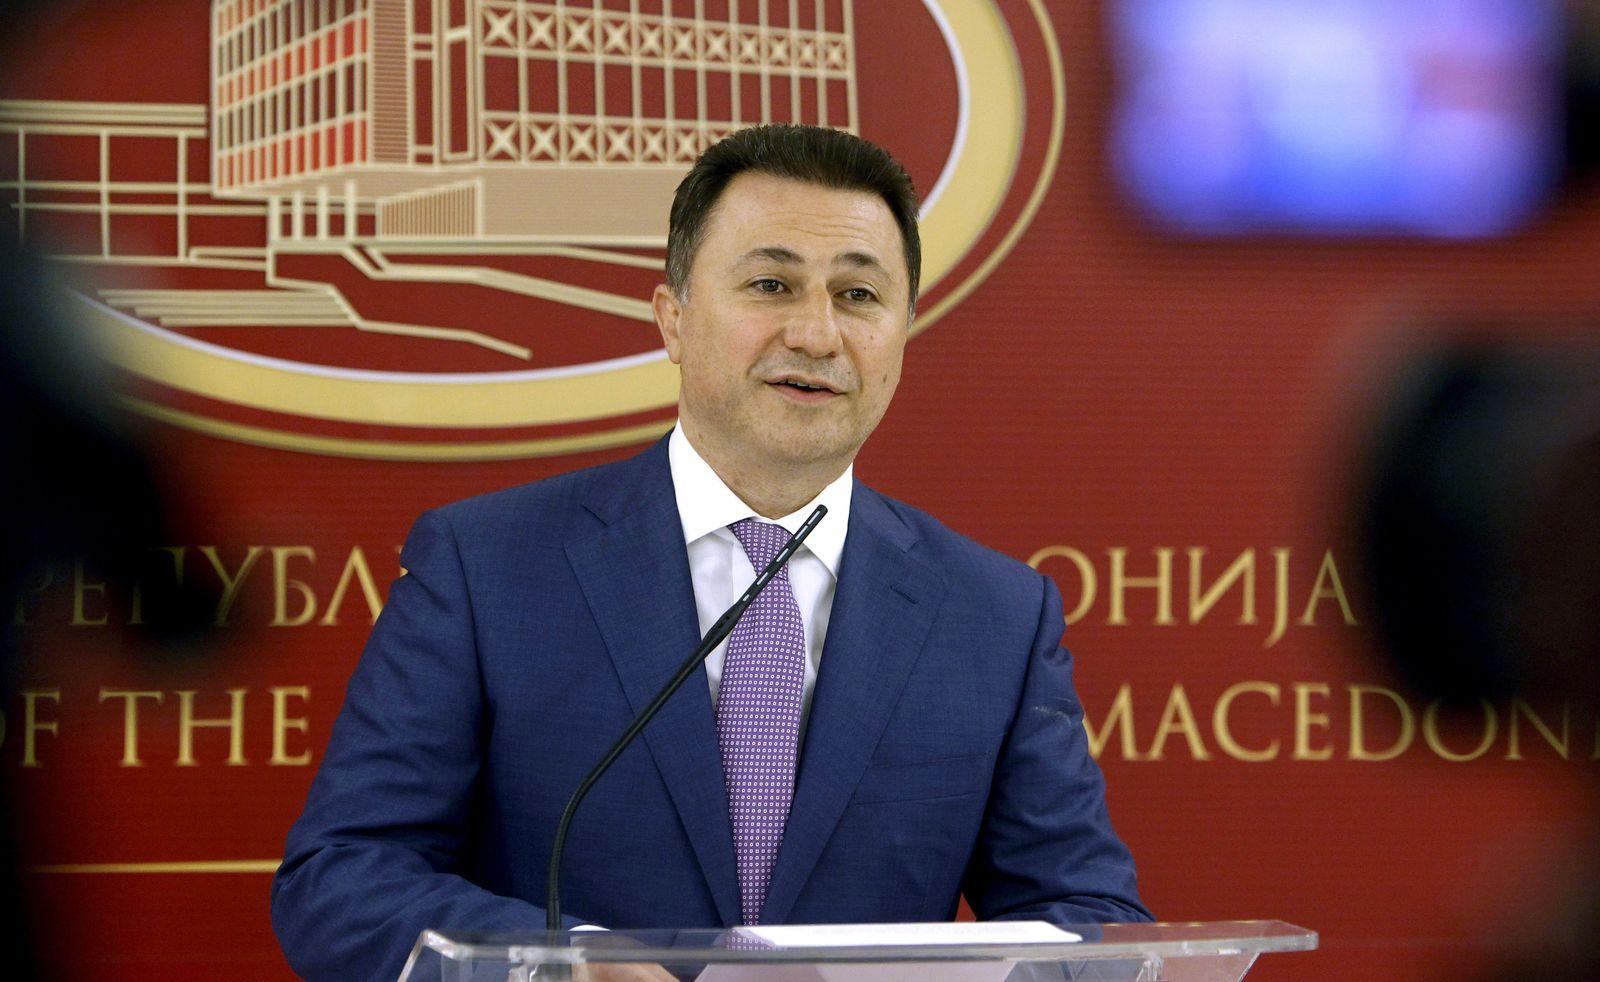 Mazedonien/ Nikola Gruevski